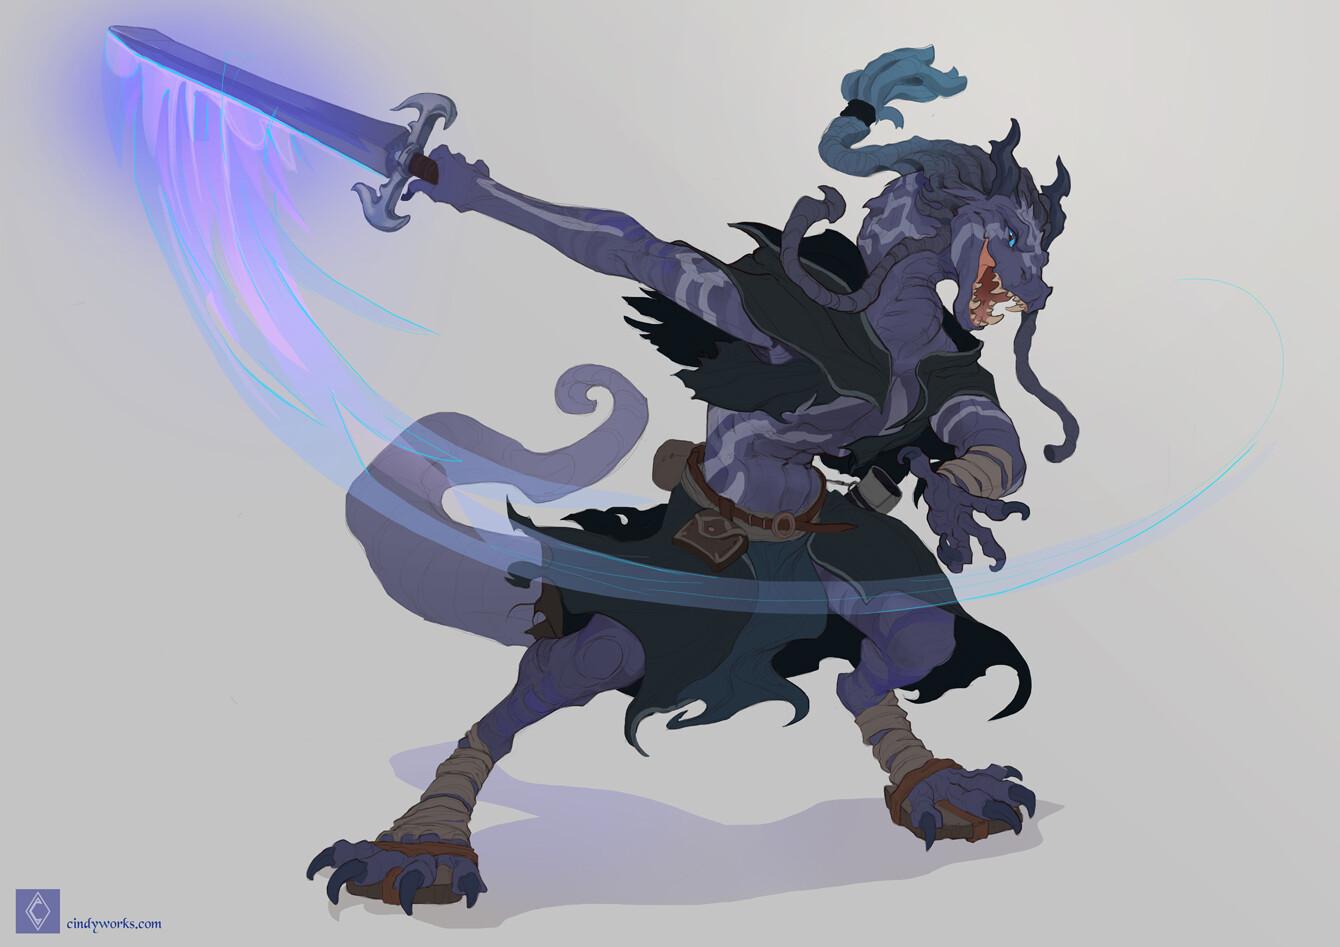 Cindy avelino rall kirax character sketch